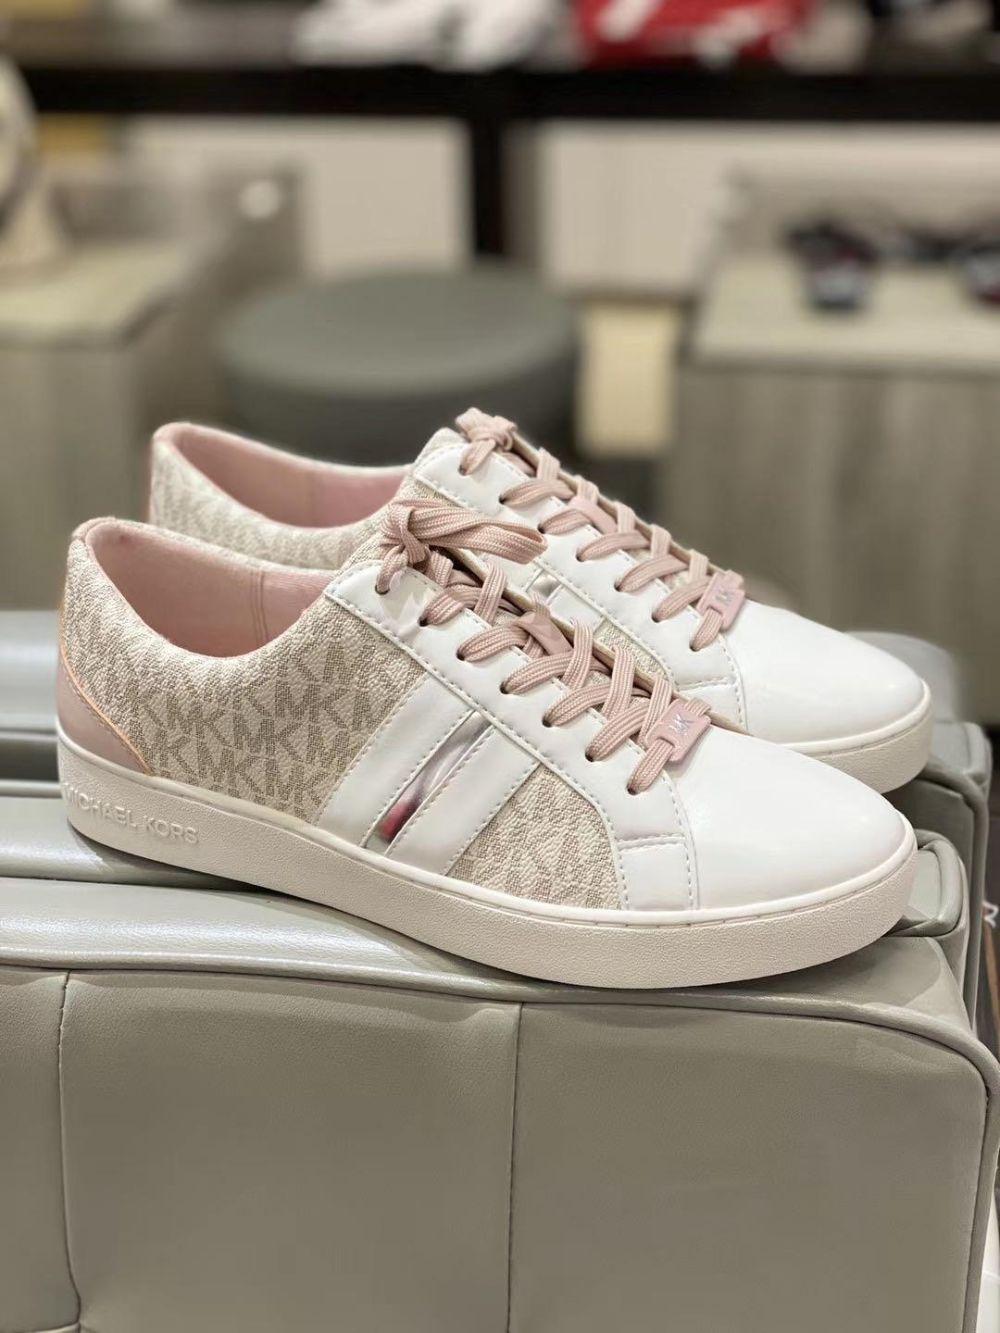 Michael Kors/MK女士板鞋 系带休闲鞋 小白鞋滑板鞋 女休闲鞋子